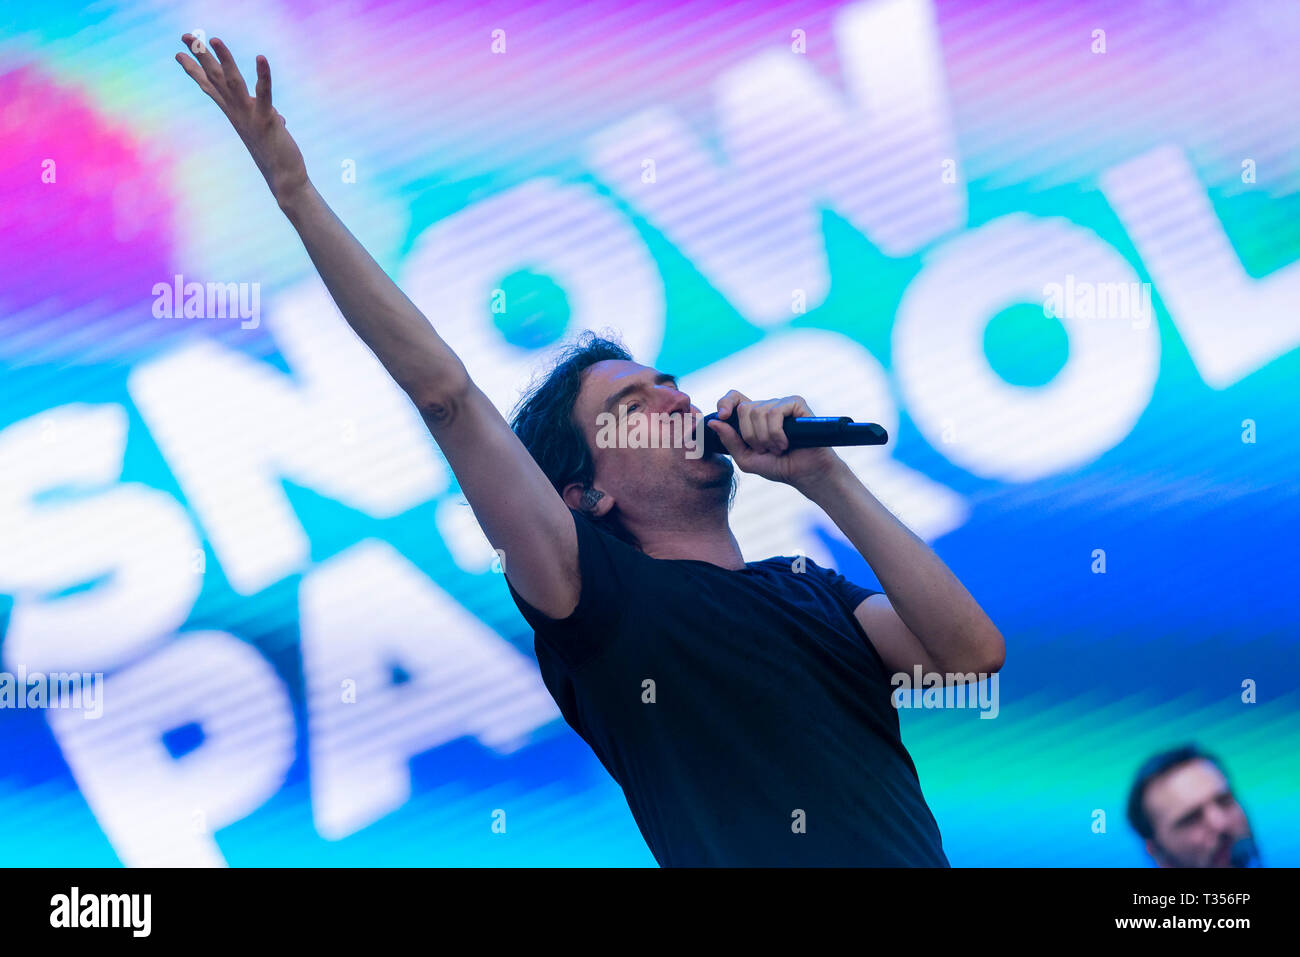 Sao Paulo, Brazil. 06th Apr, 2019. Snow Patrol performs at the Lollapalooza 2019 festival, held at the Autodromo de Interlagos in São Paulo, on Saturday afternoon, 06. (PHOTO: ANDERSON LIRA/BRAZIL PHOTO PRESS) Credit: Brazil Photo Press/Alamy Live News - Stock Image